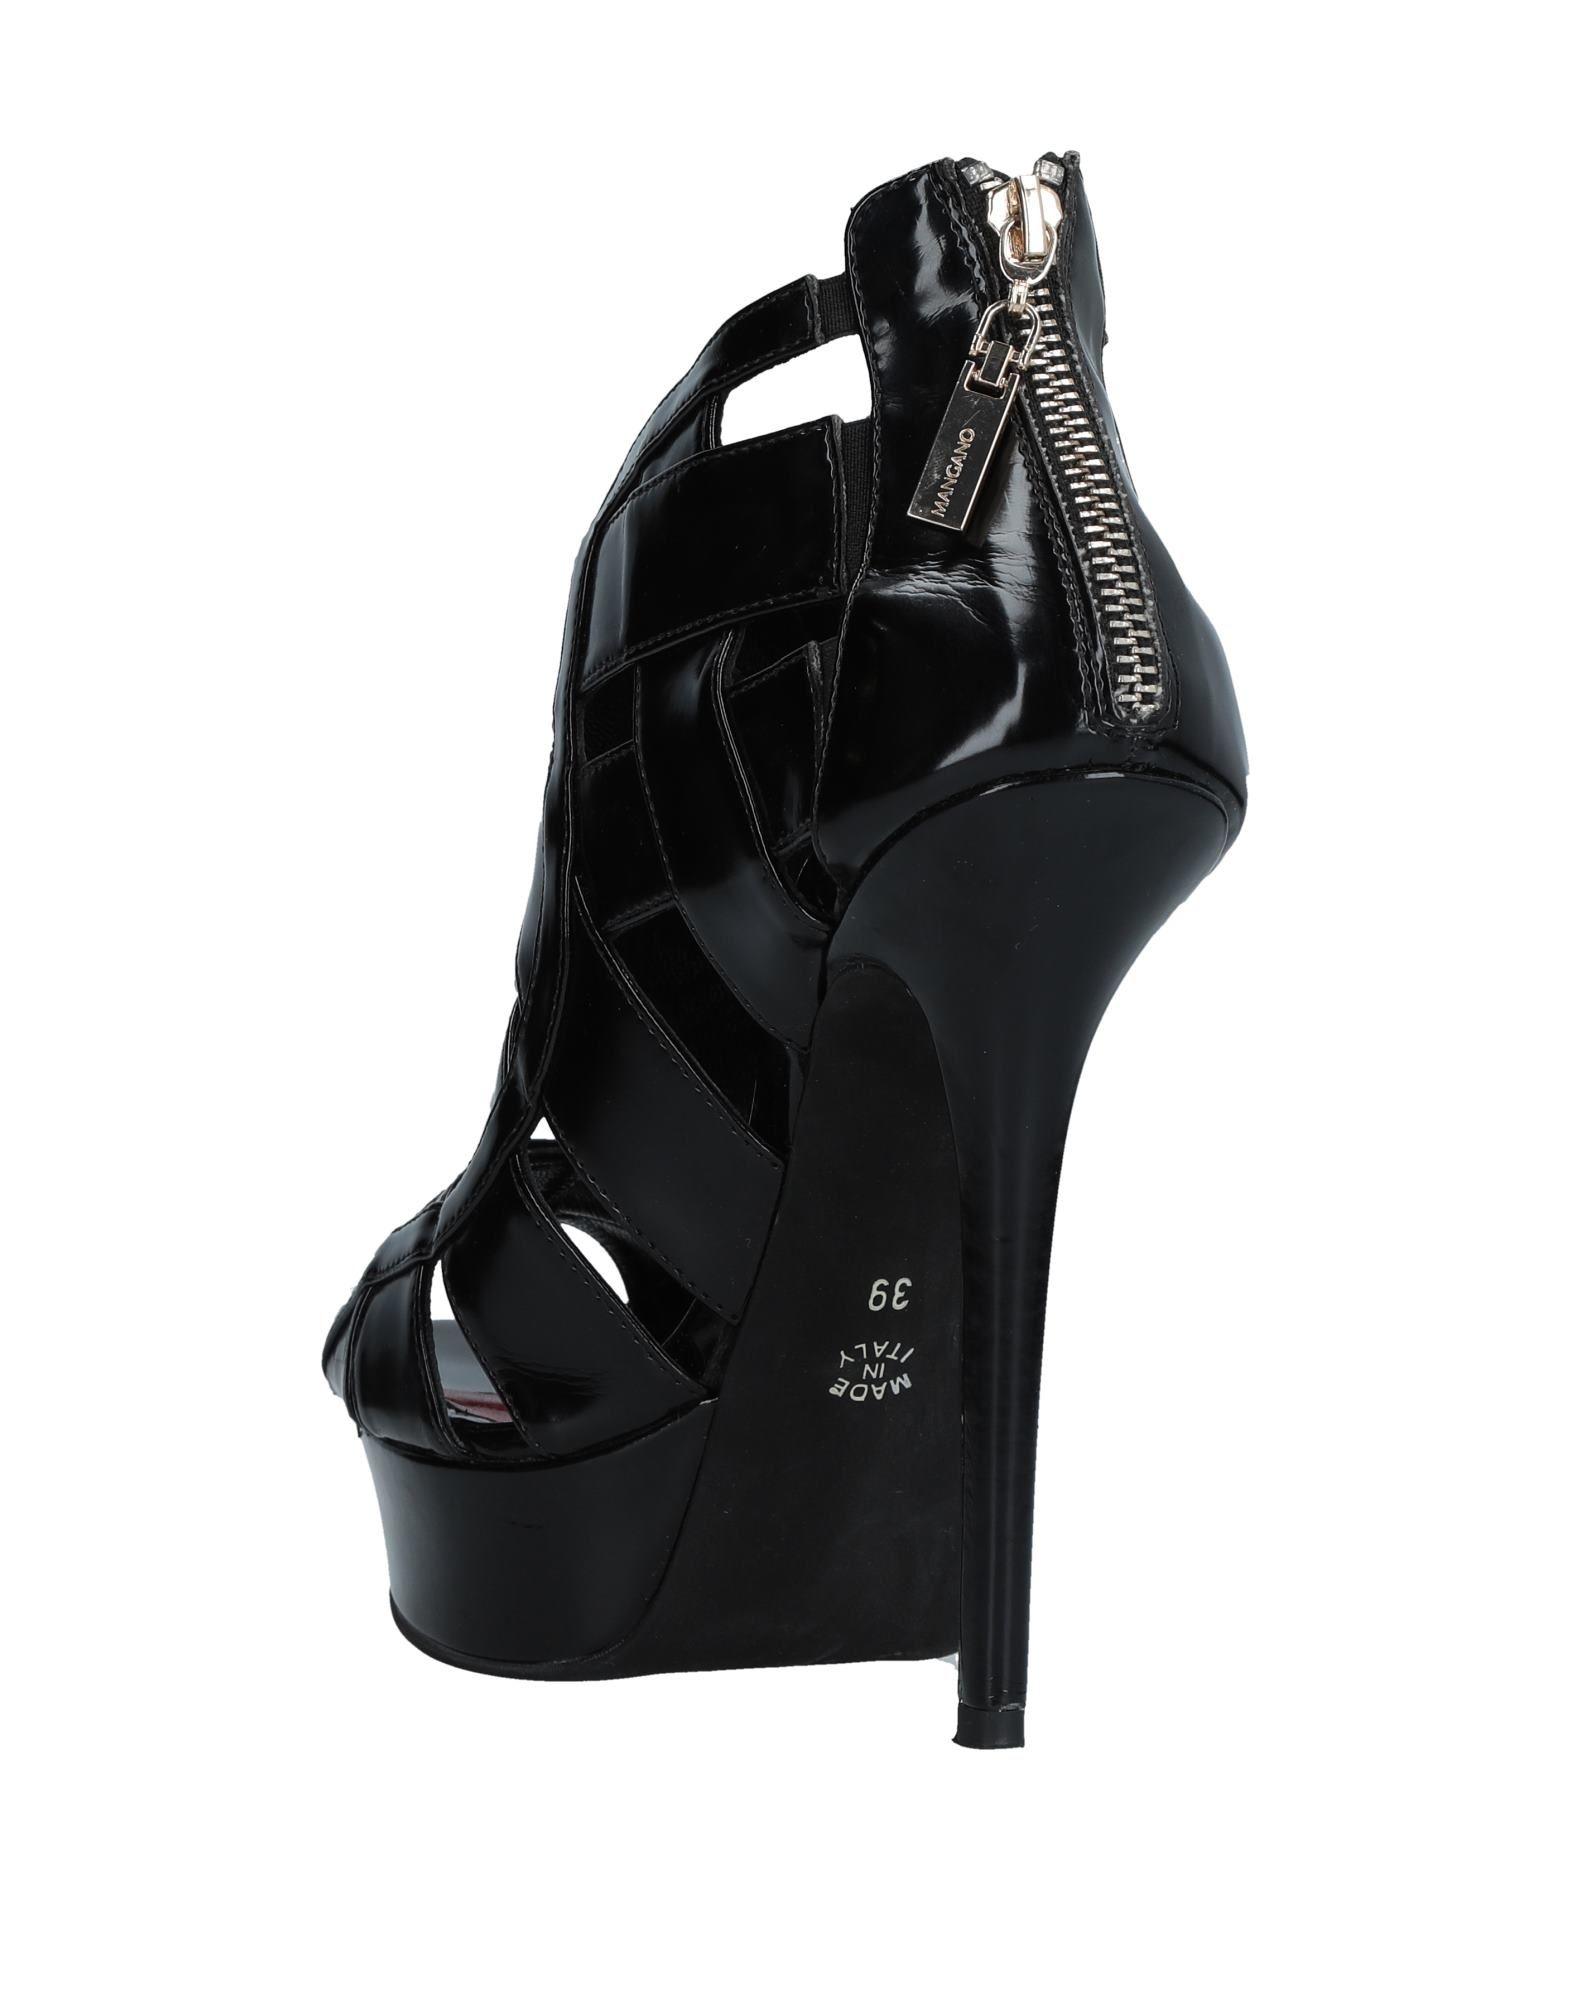 Stilvolle billige Schuhe Damen Mangano Stiefelette Damen Schuhe  11534583EE 93a14e